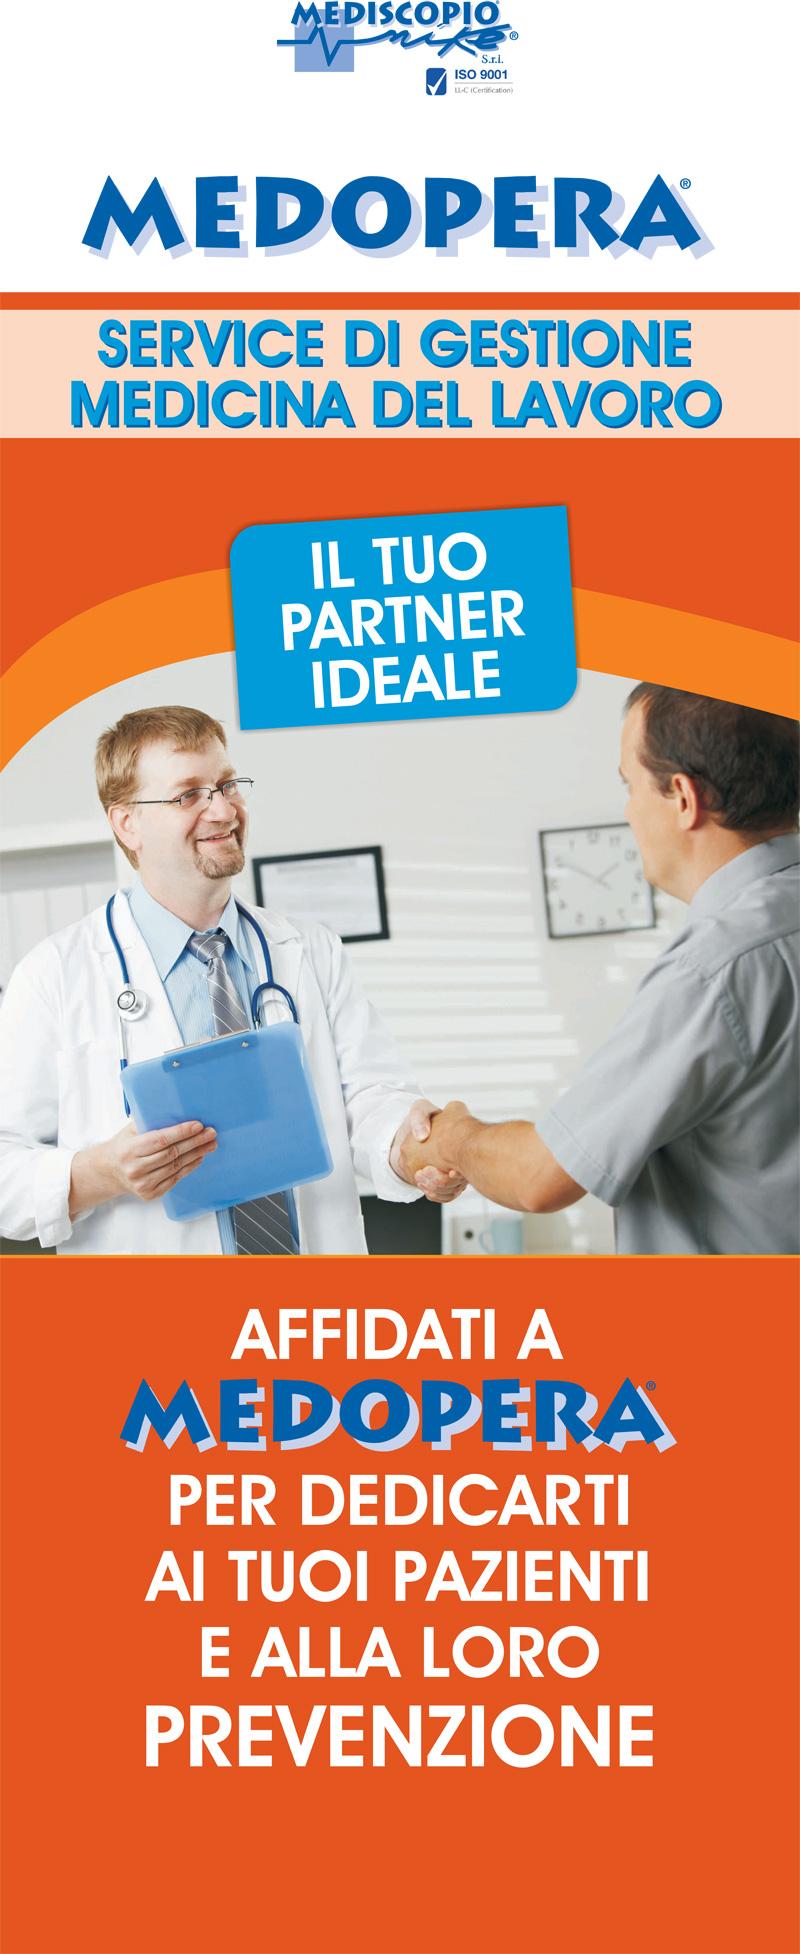 Service gestione medicina del lavoro